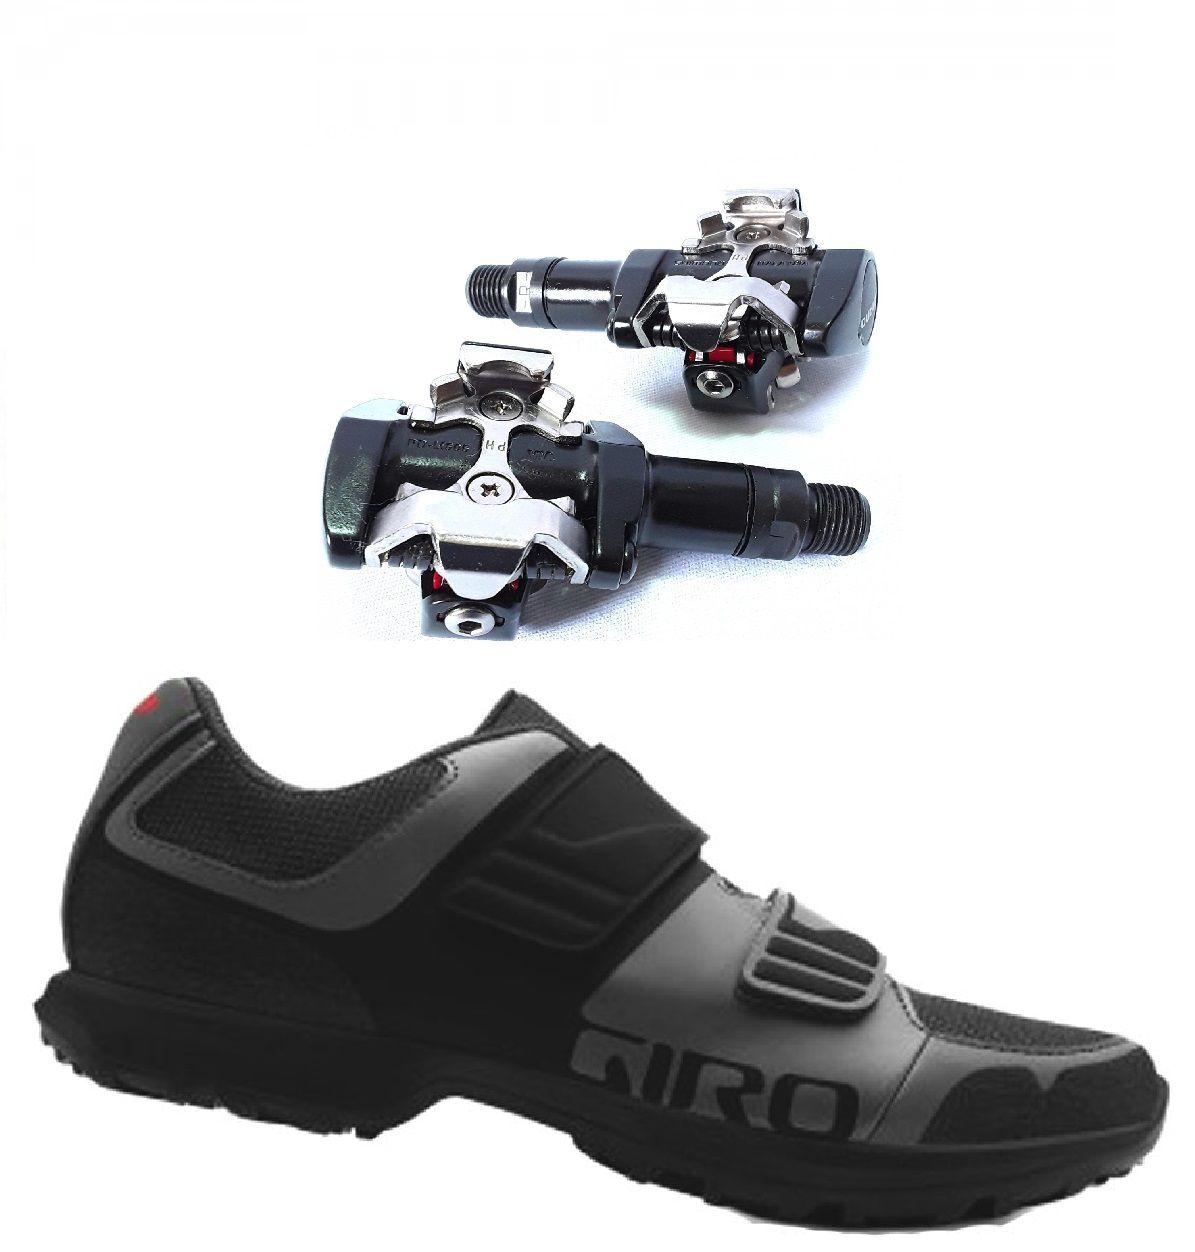 Kit Sapatilha Giro Berm + Pedal Clip Shimano PD-M505